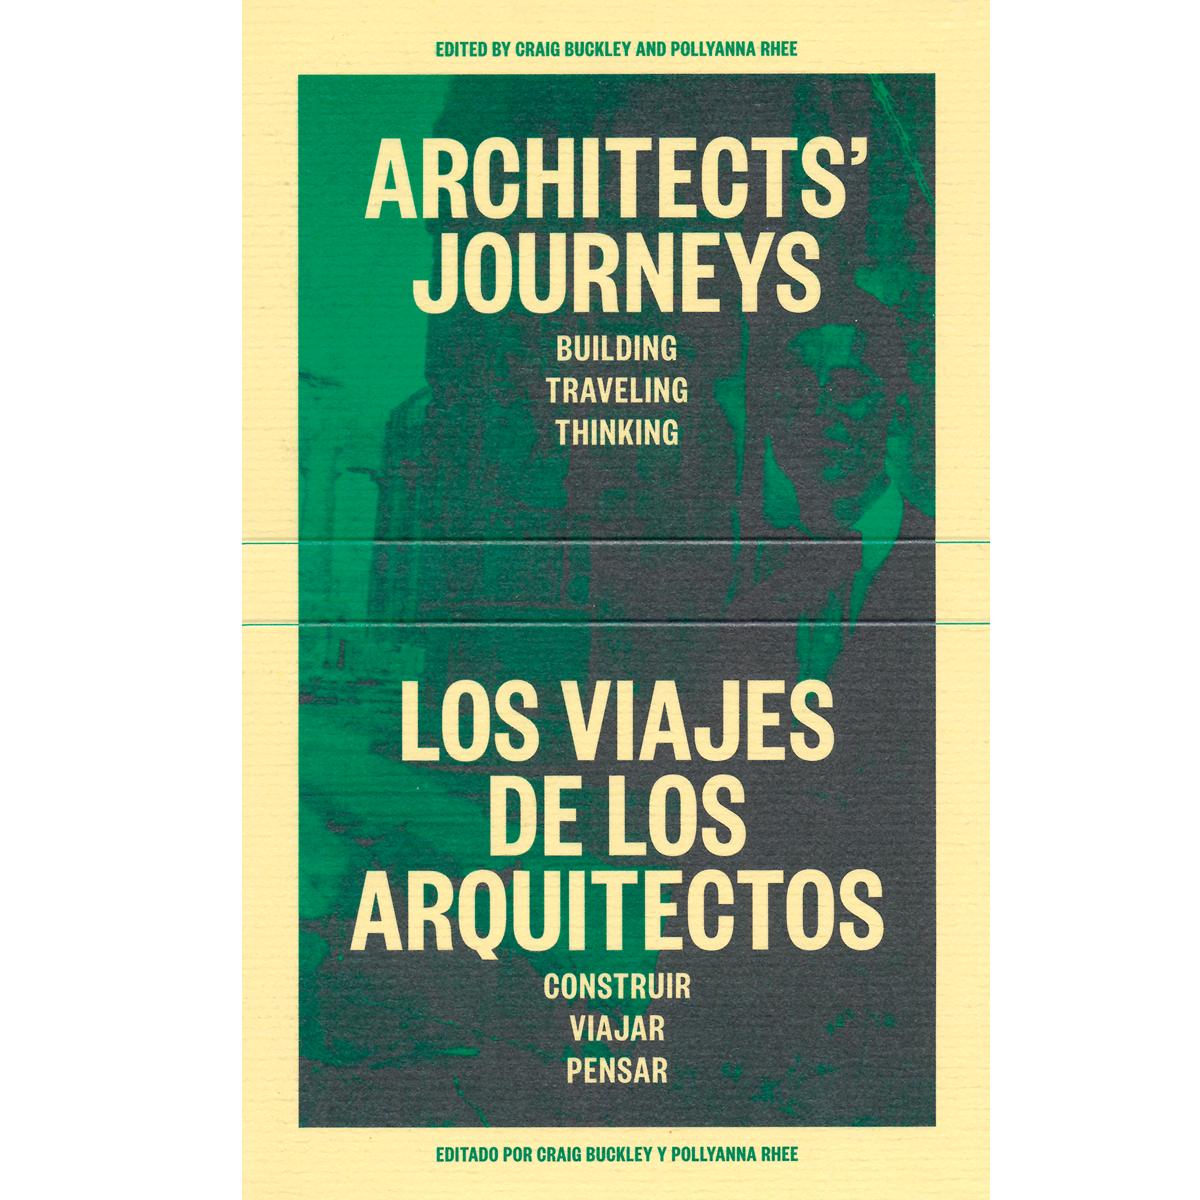 Architects Journeys